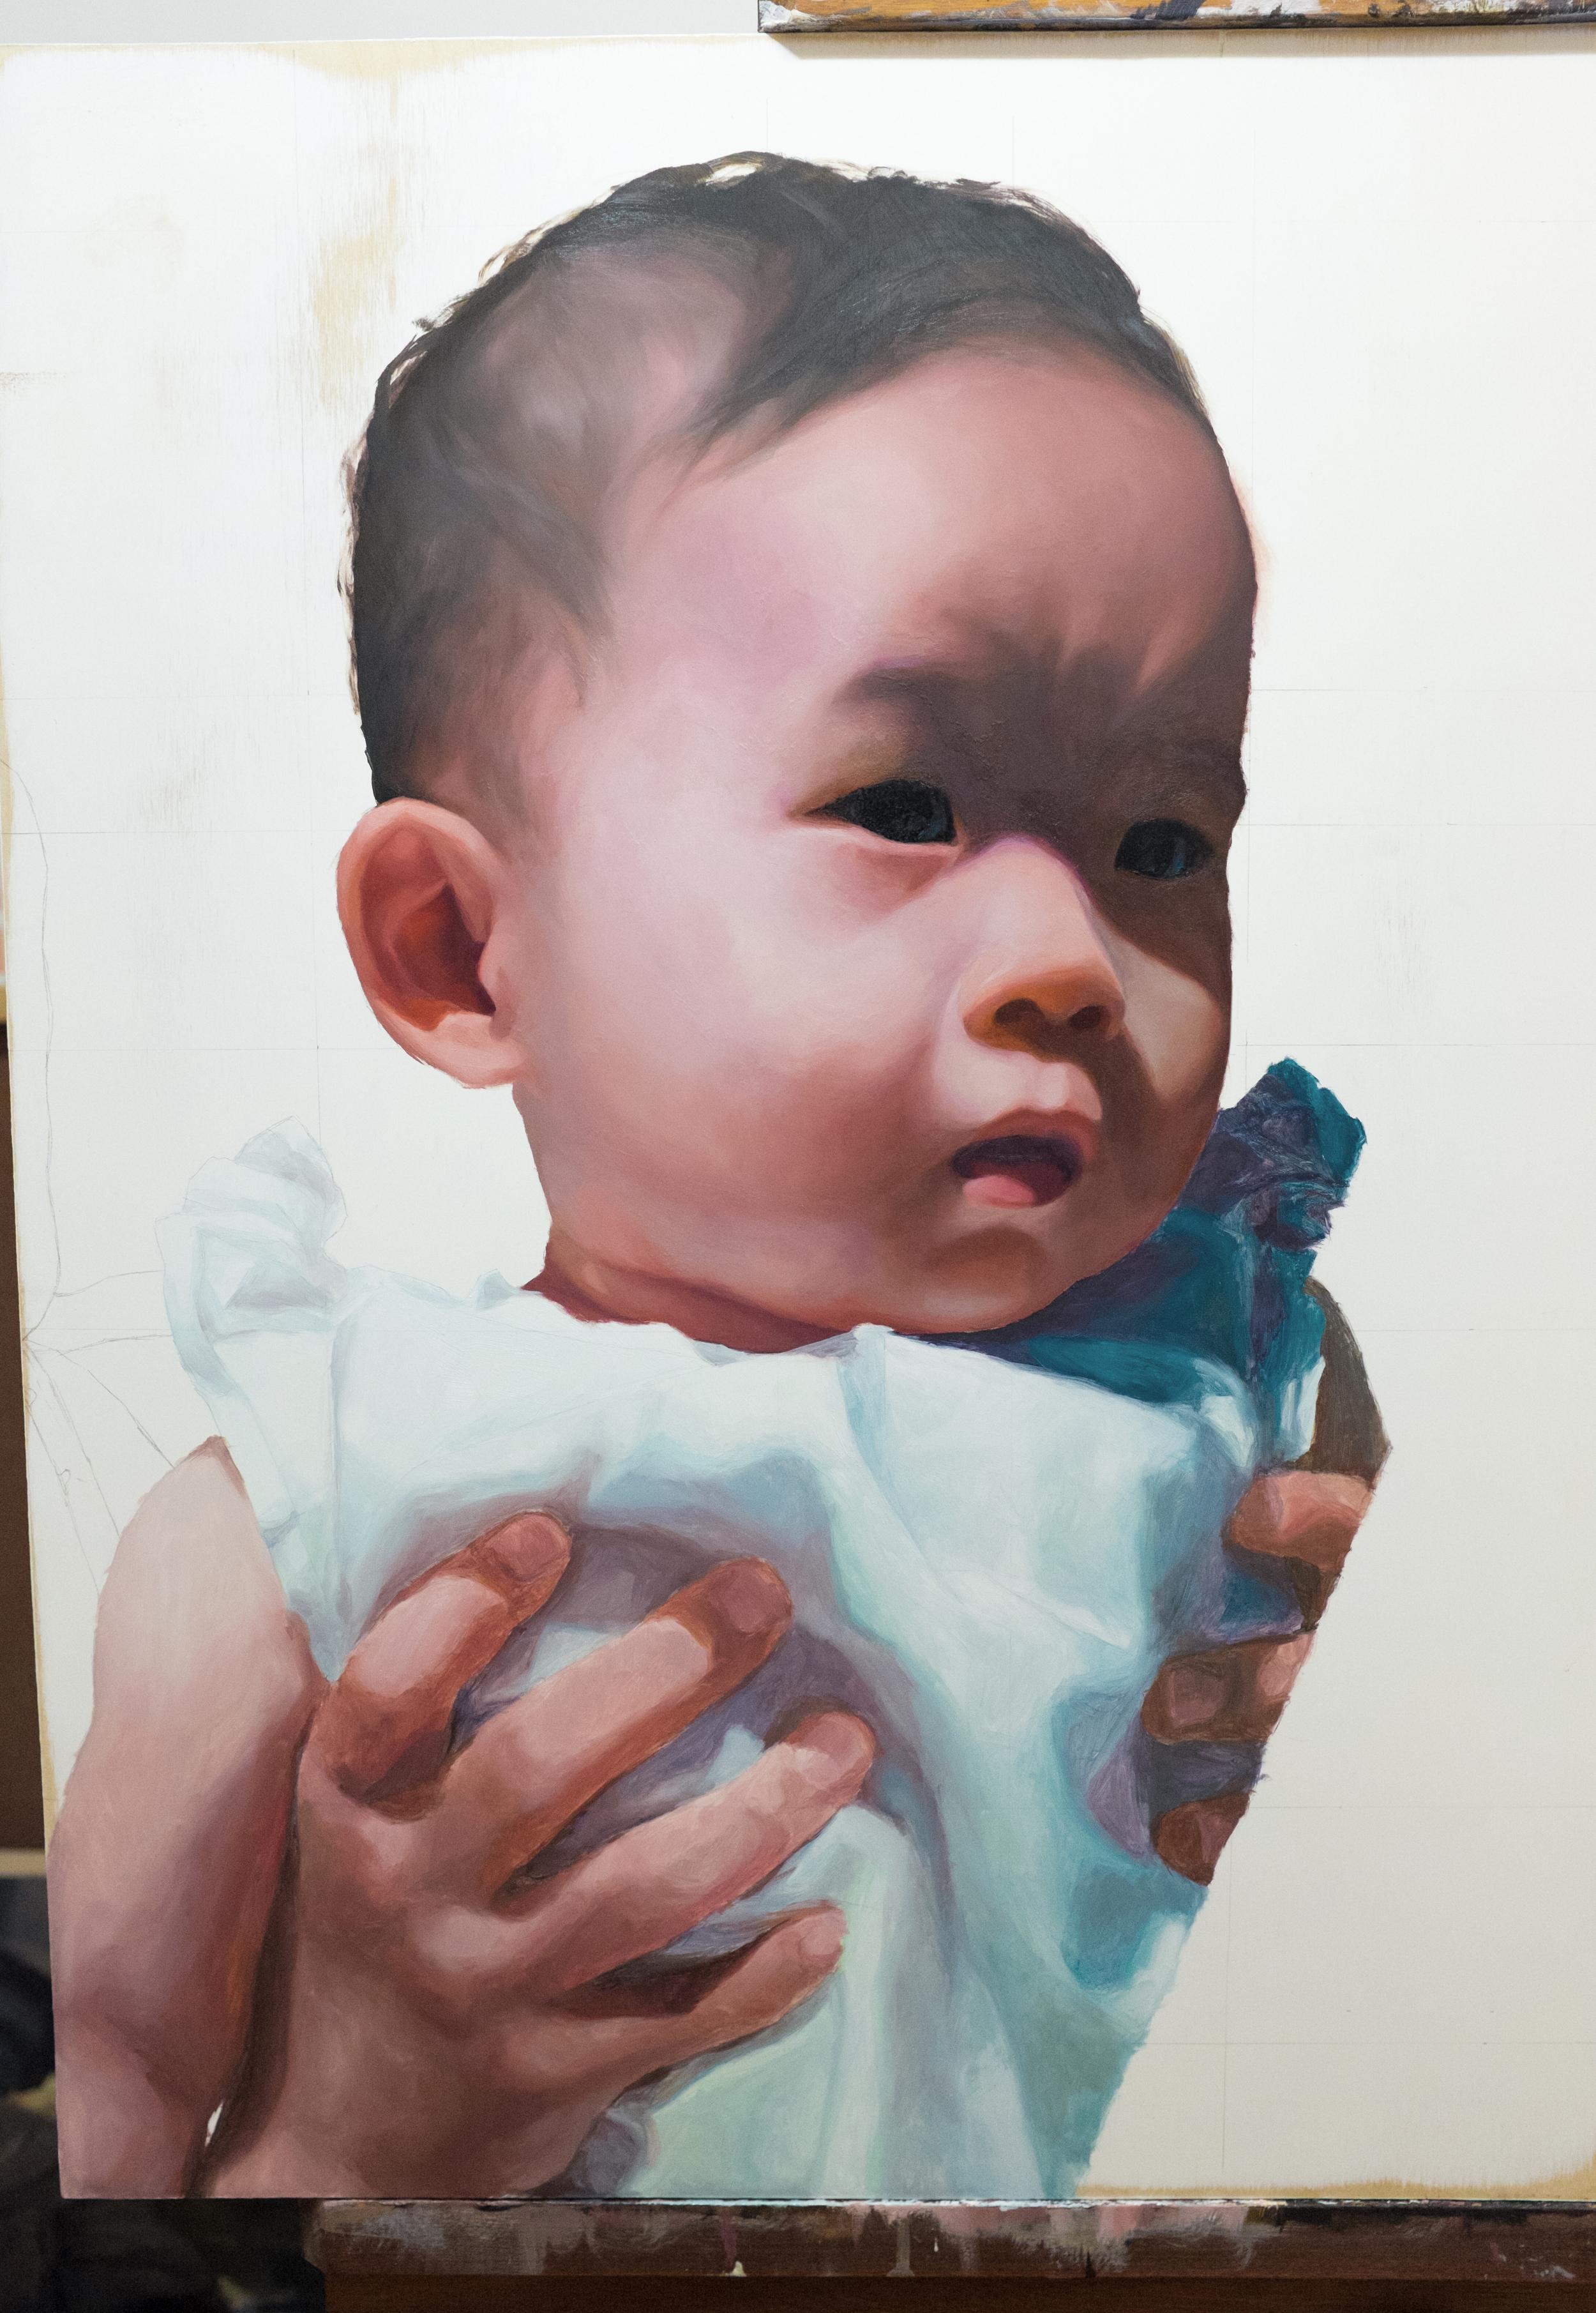 by Clifton Phachanla (Instructor - Keita Morimoto)